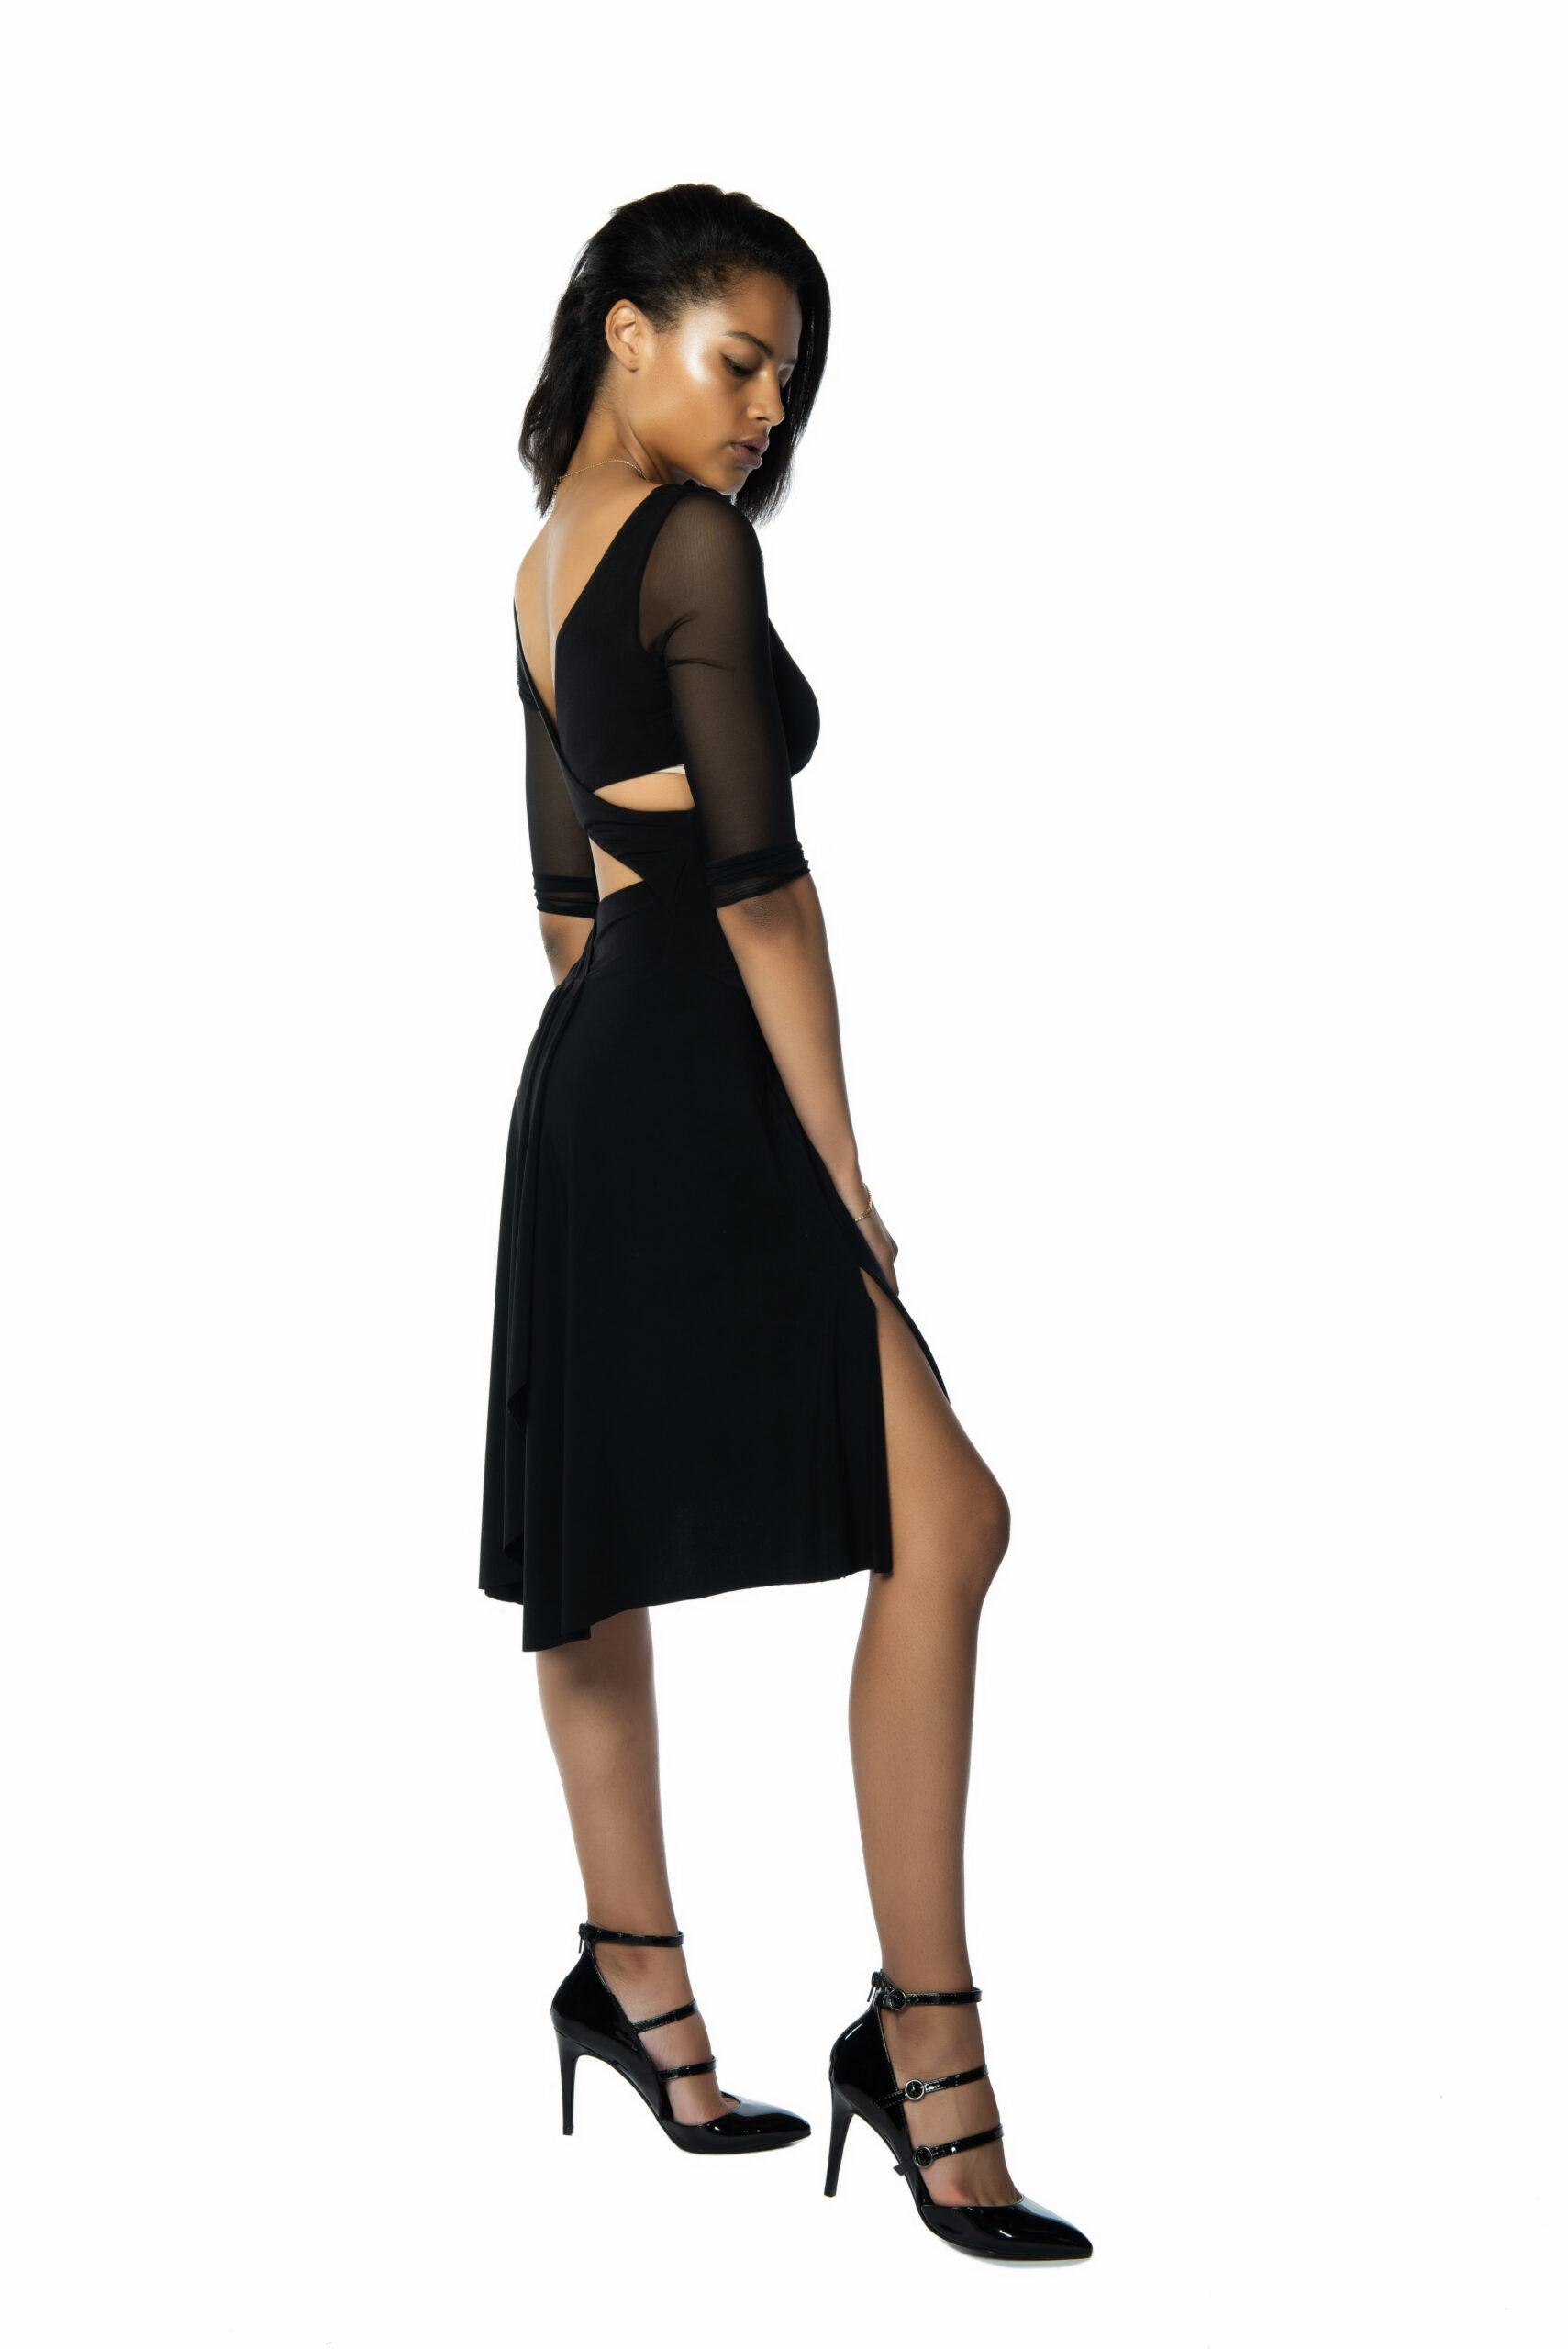 A beautiful Ferrari tango dress with tulle sleeves